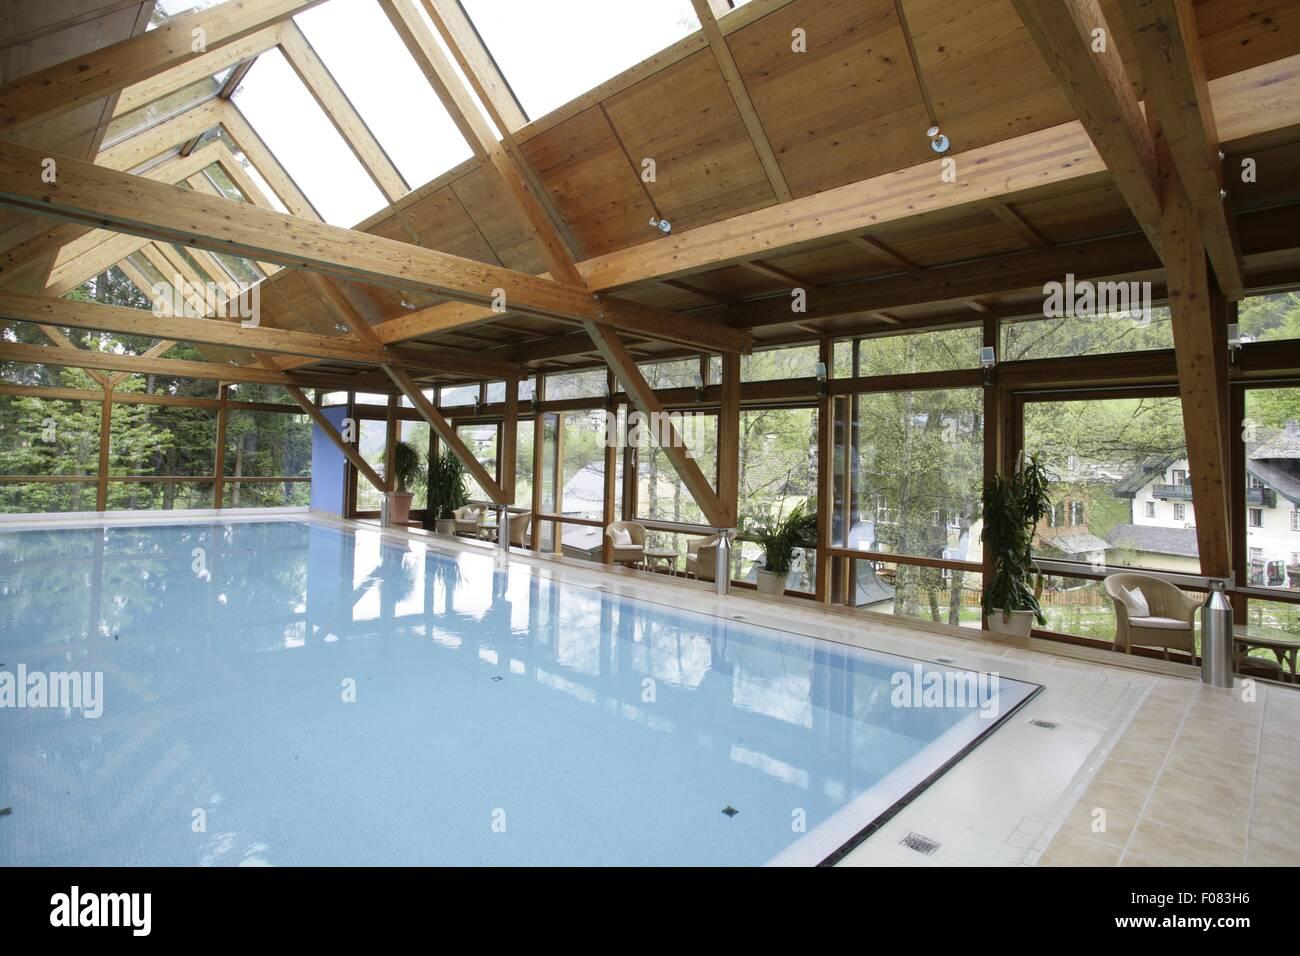 Swimming pool in Hotel Hollweger, Sankt Gilgen, Salzburg, Austria - Stock Image